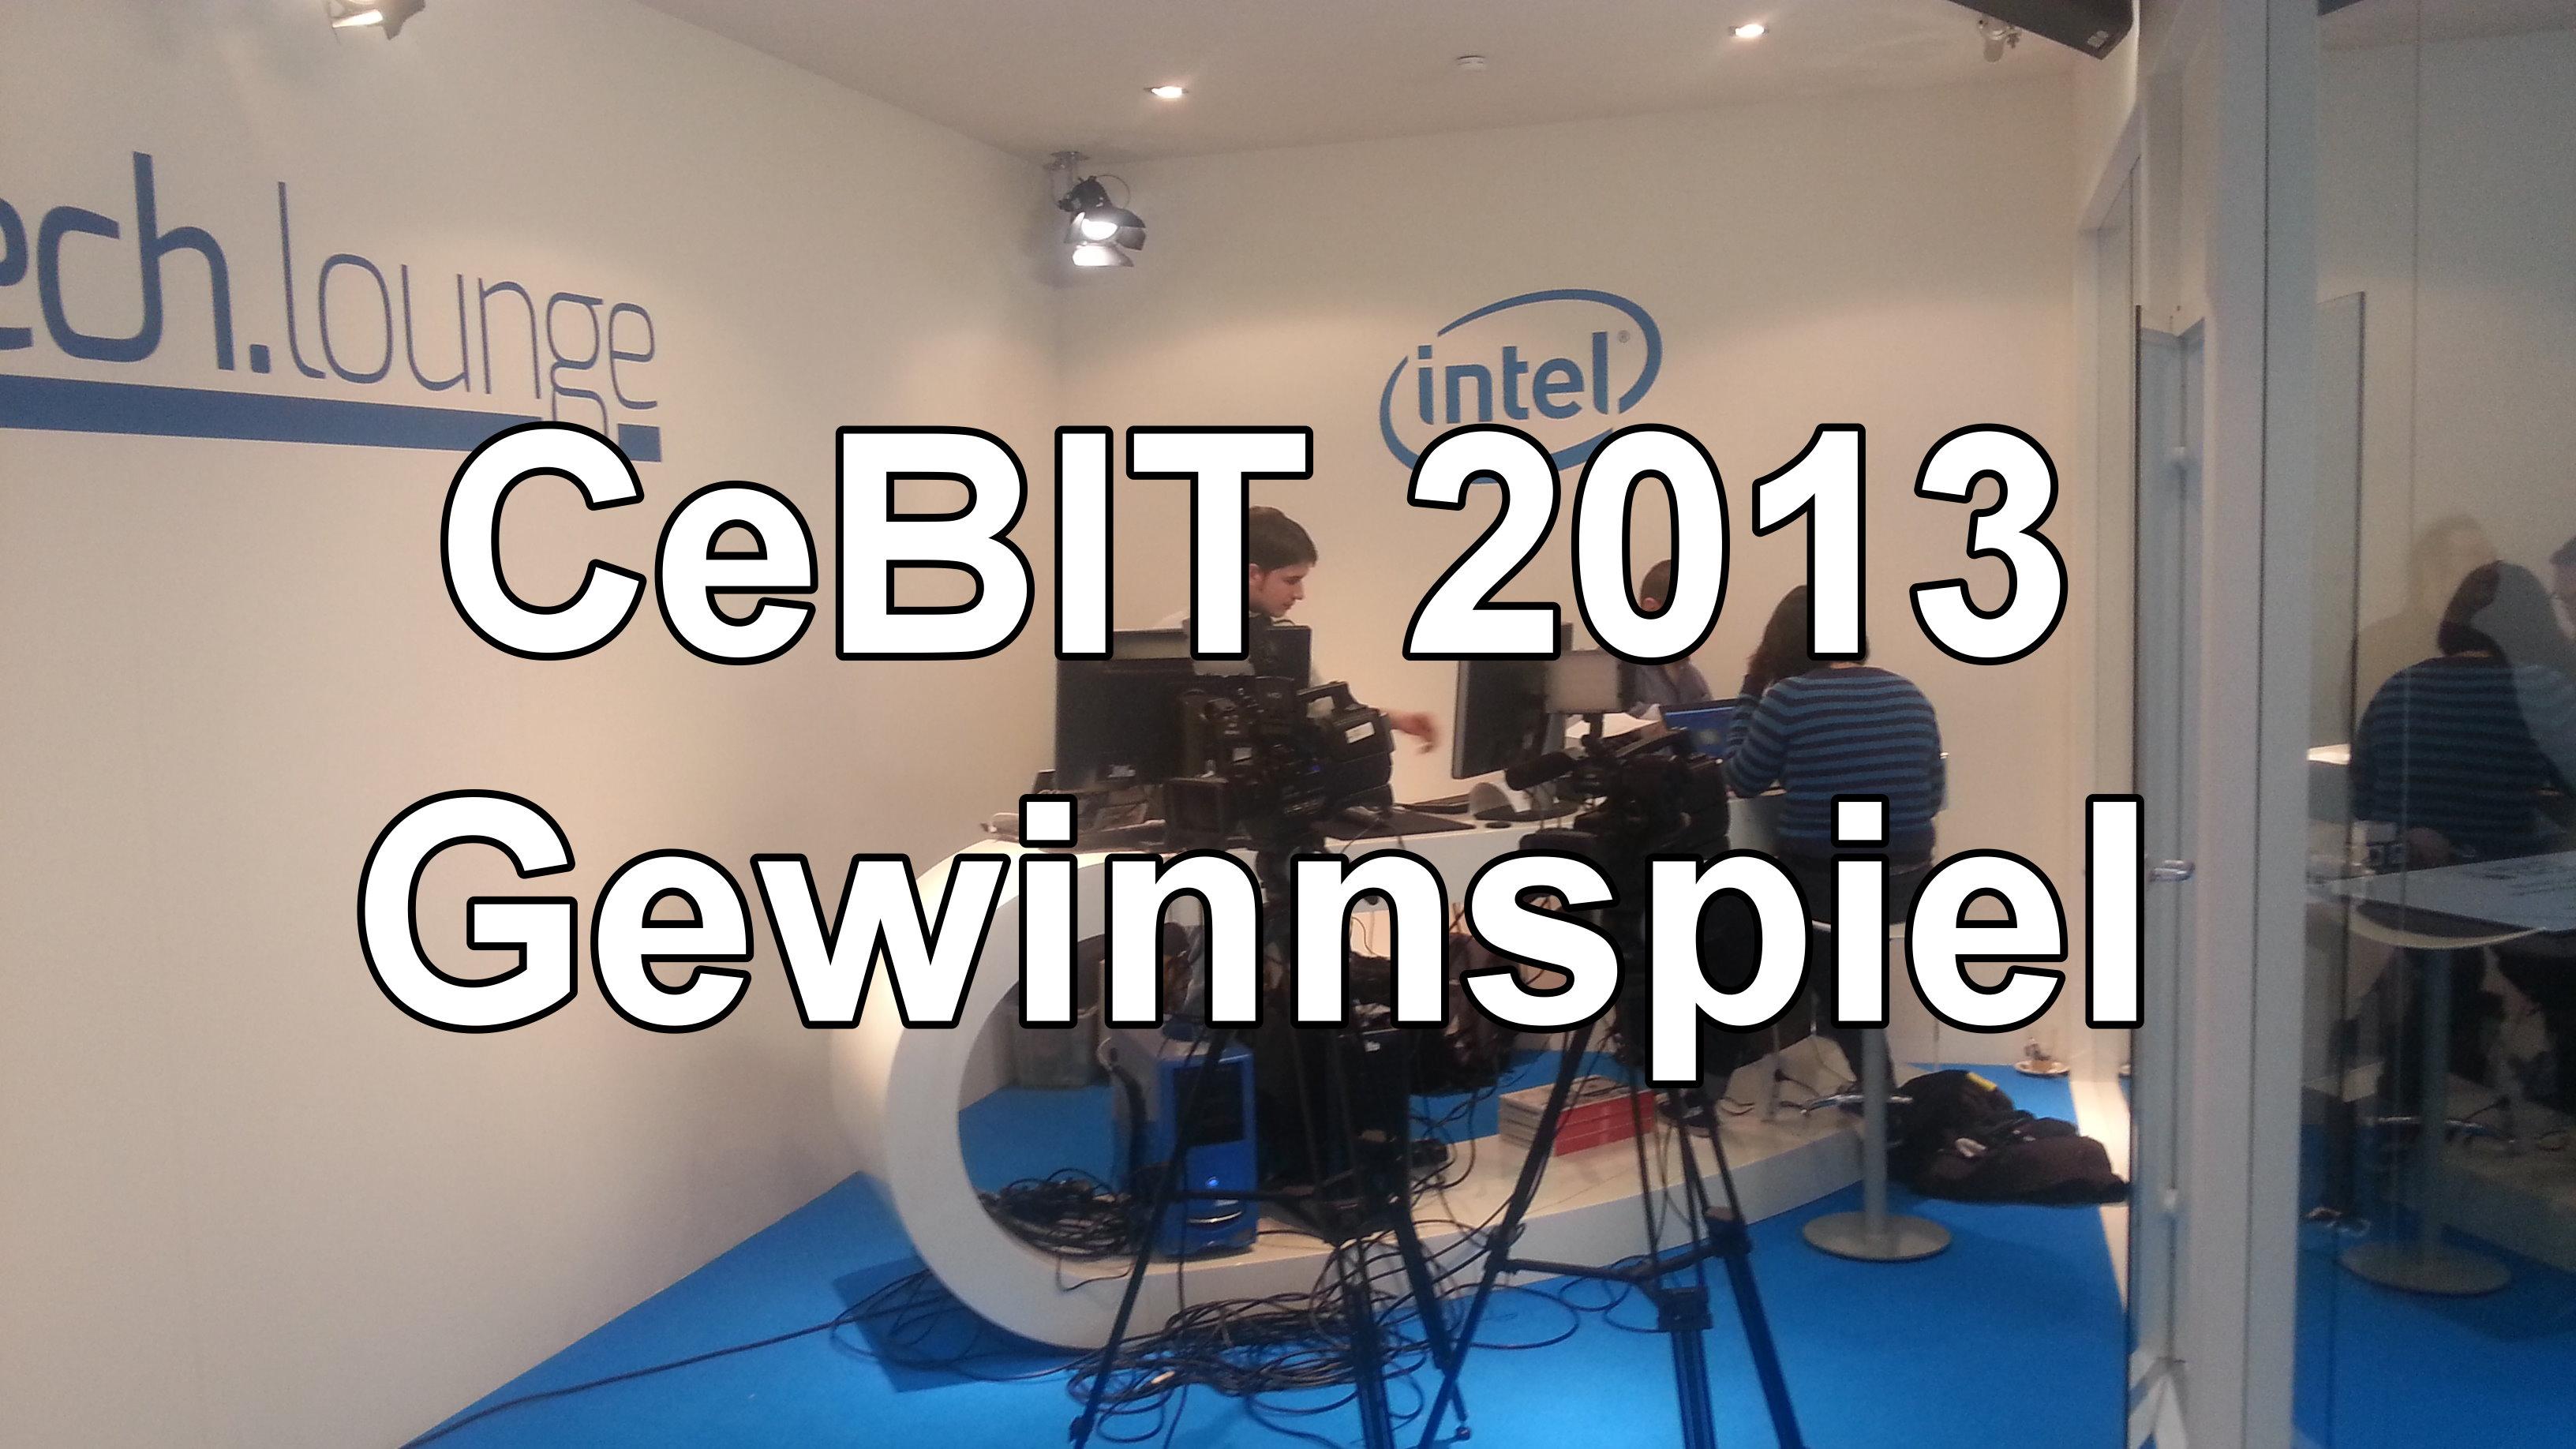 CeBIT Gewinnspiel – Ultrabooks, Tablets, Smartphones und viel Zubehoer – Heute letzter Tag!